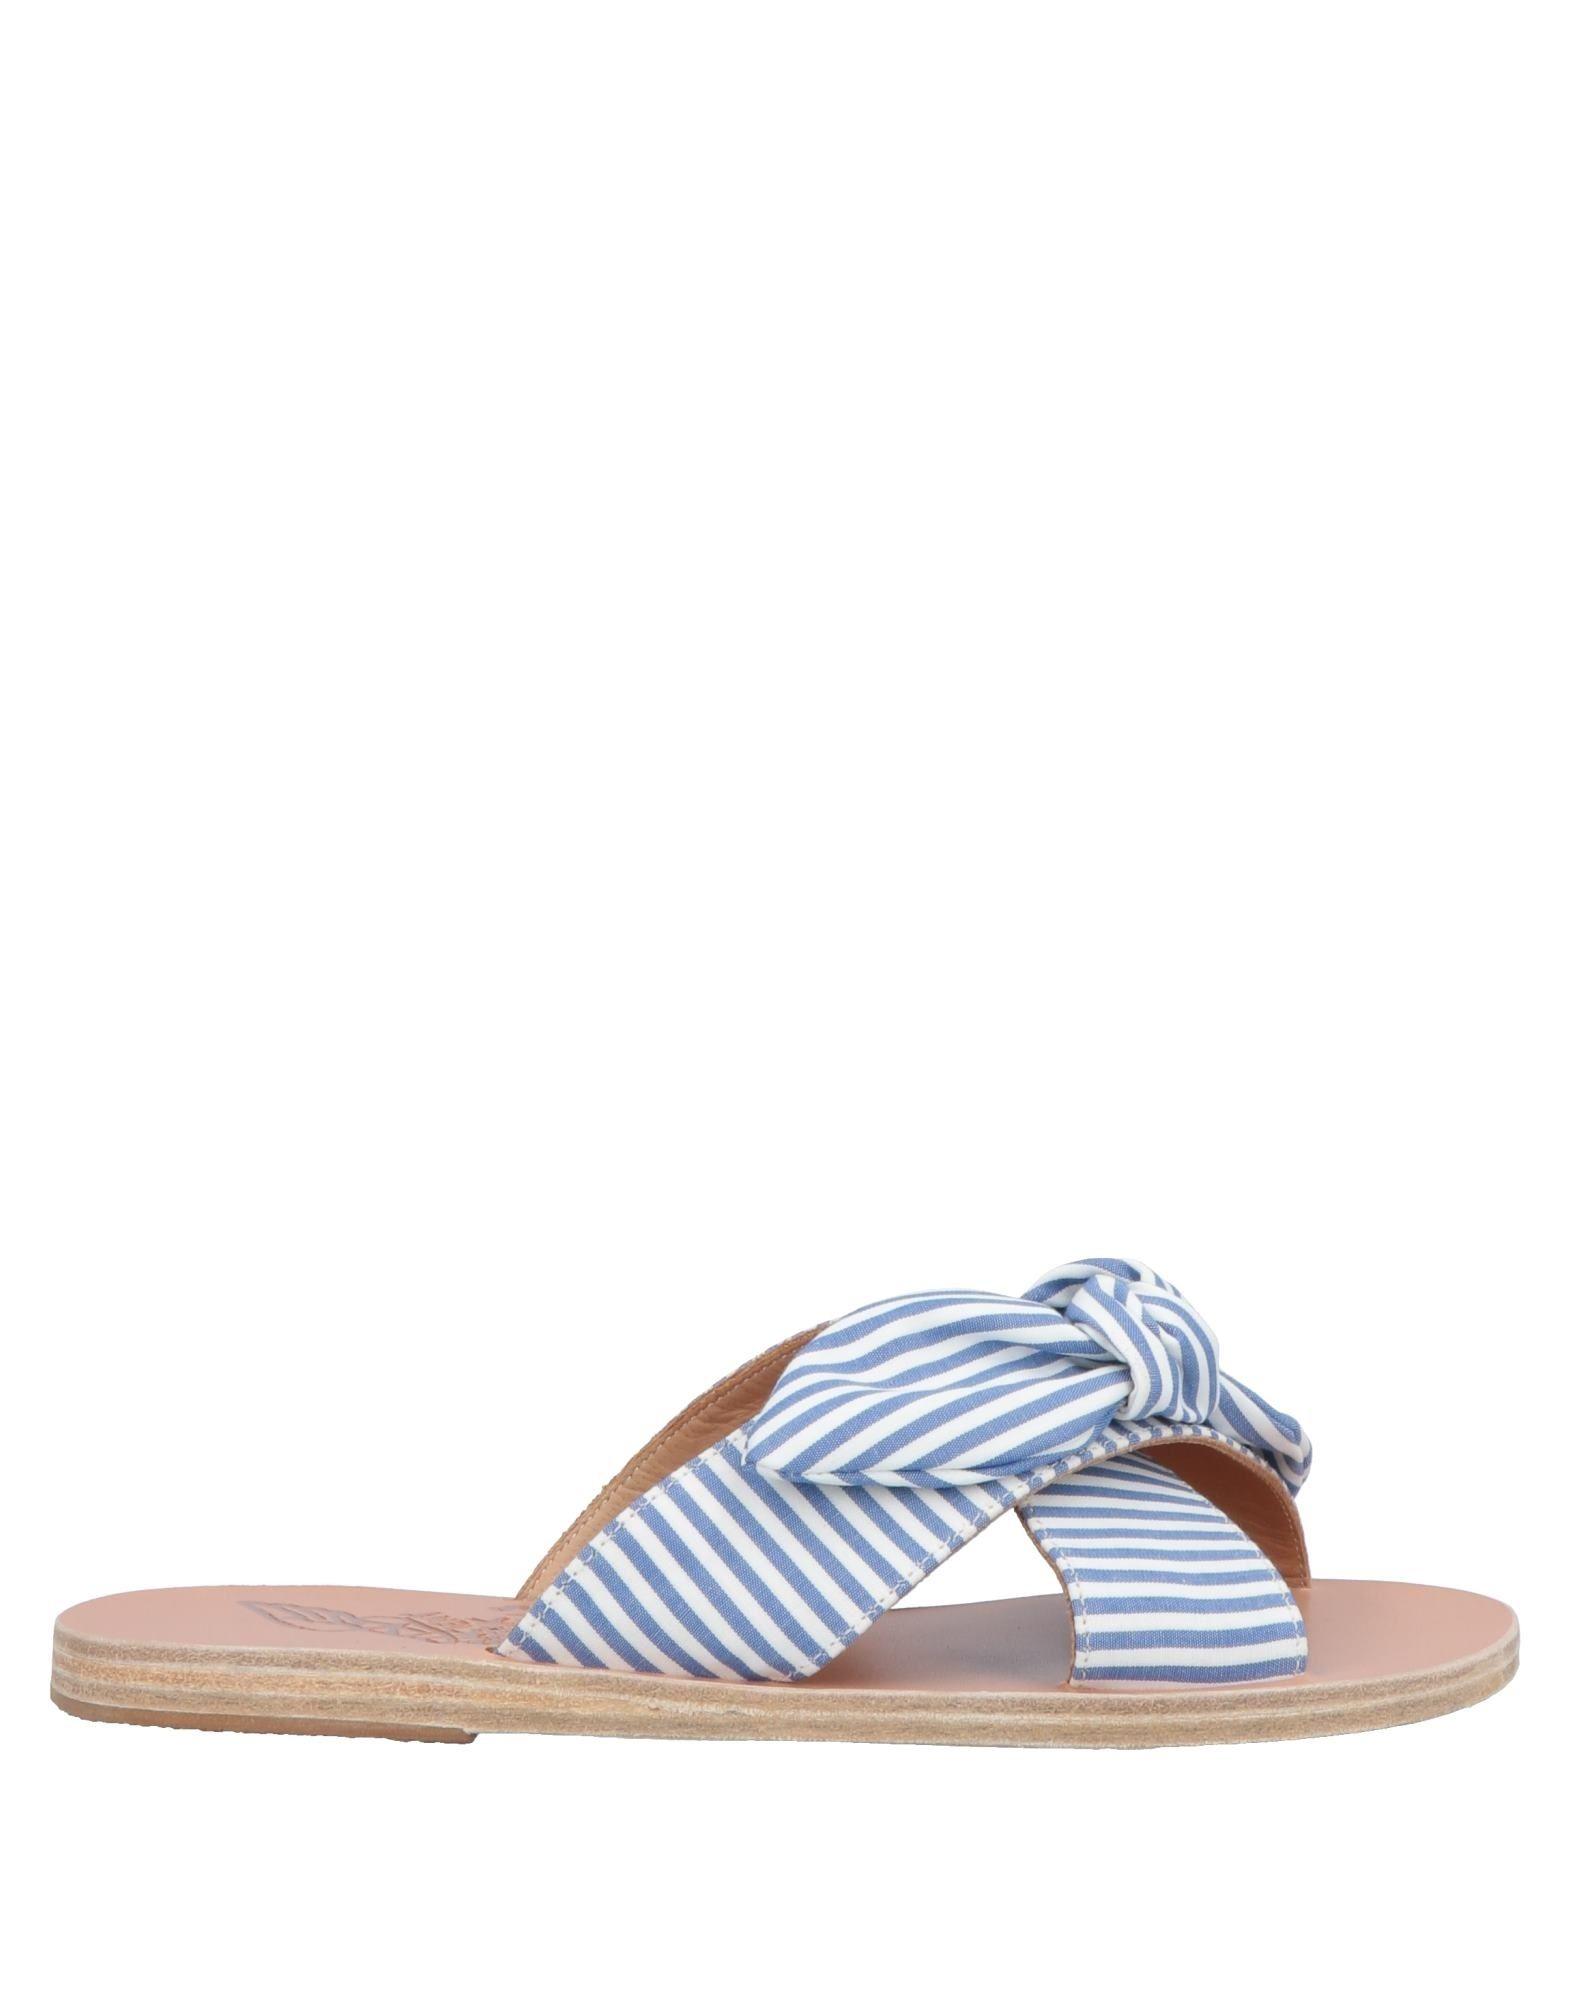 ANCIENT GREEK SANDALS Сандалии 2018 women sandals flat with shoes bandage bohemia leisure lady sandals peep toe outdoor women s summer footwear shoes 3 27